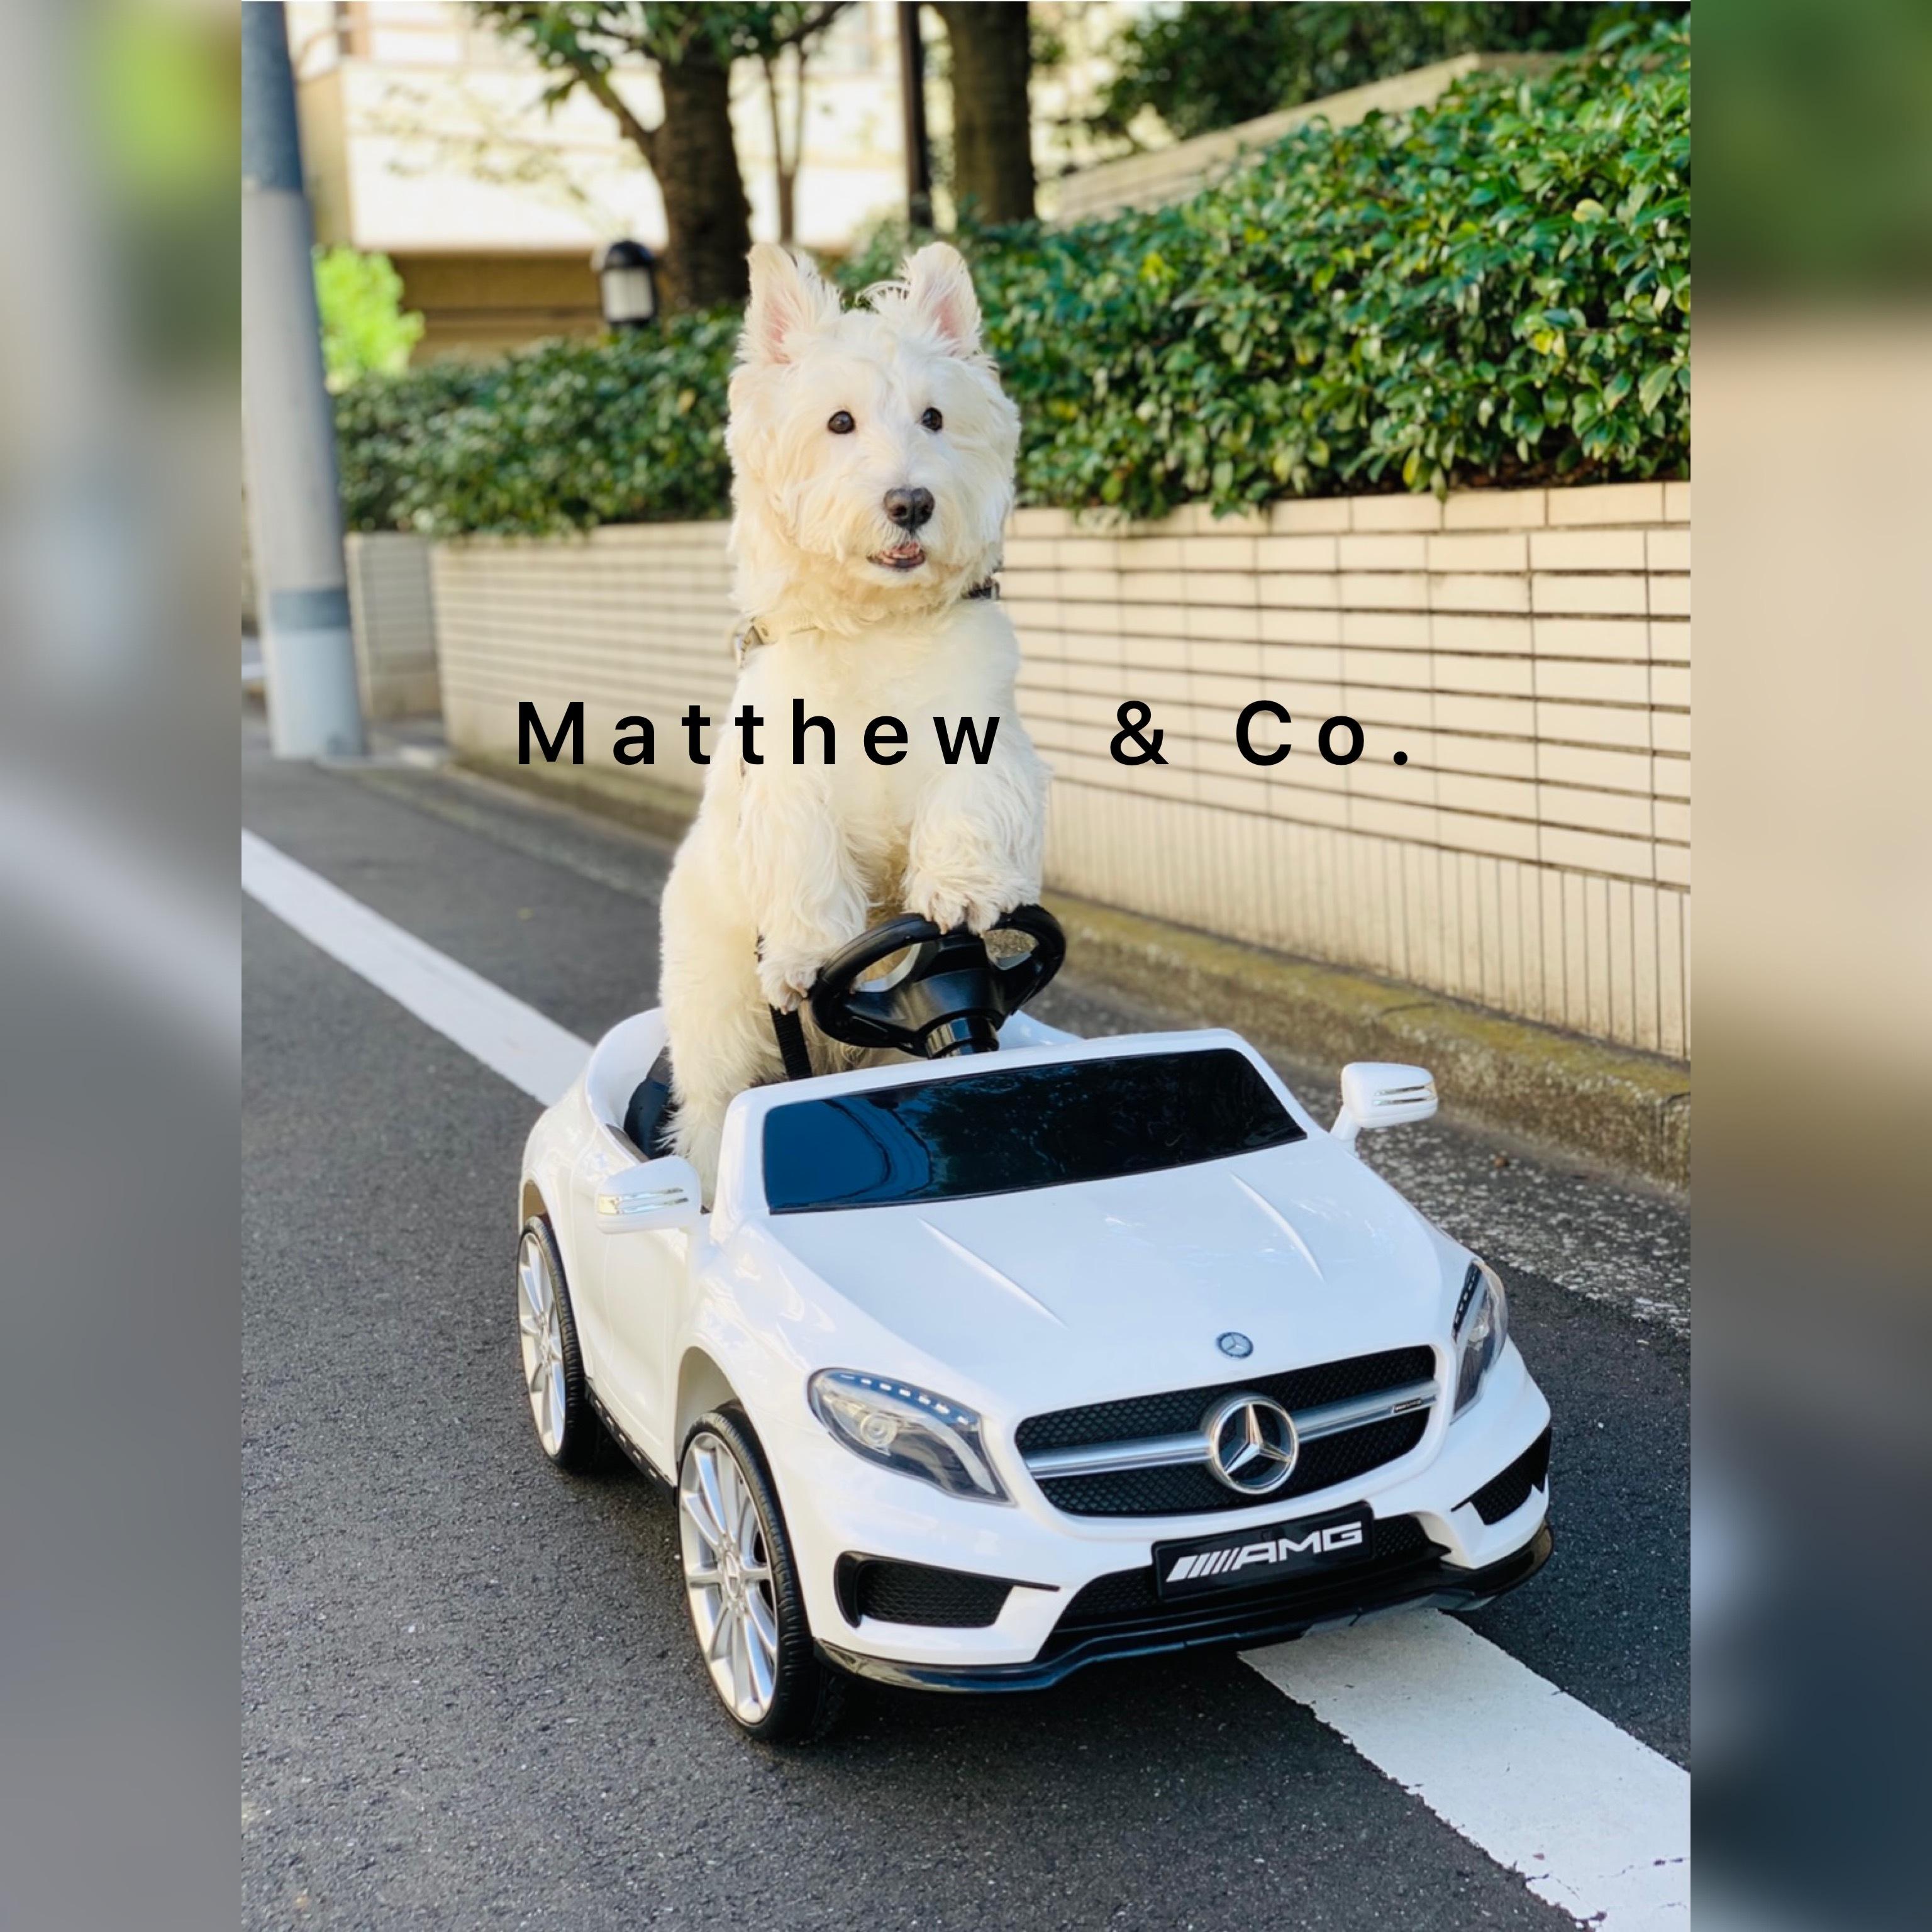 Matthew & Co.